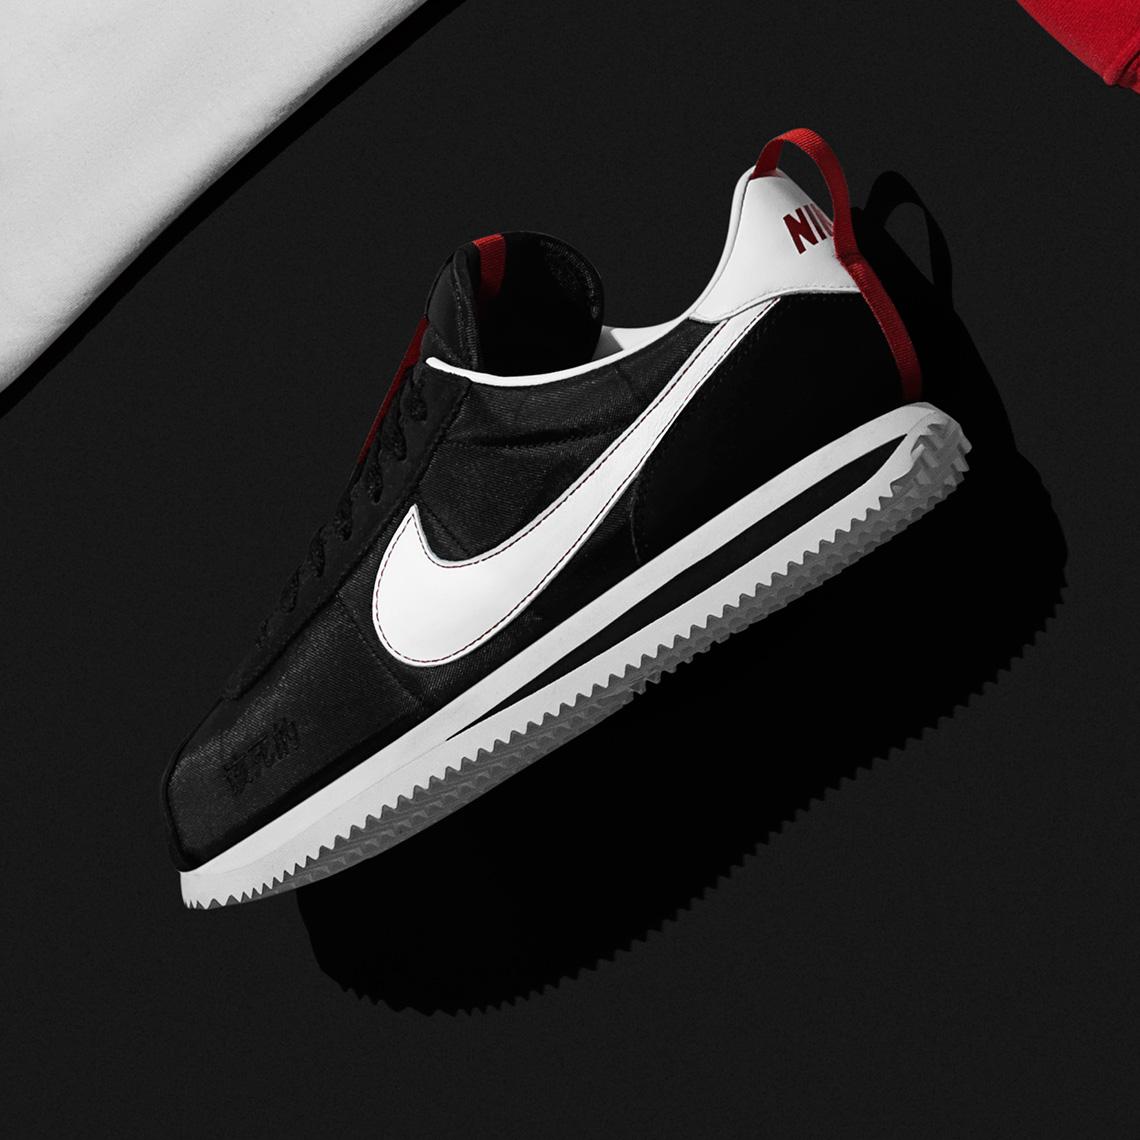 1ad0d8c0d Where To Buy Nike Kendrick Lamar TDE The Championship Tour Merch ...